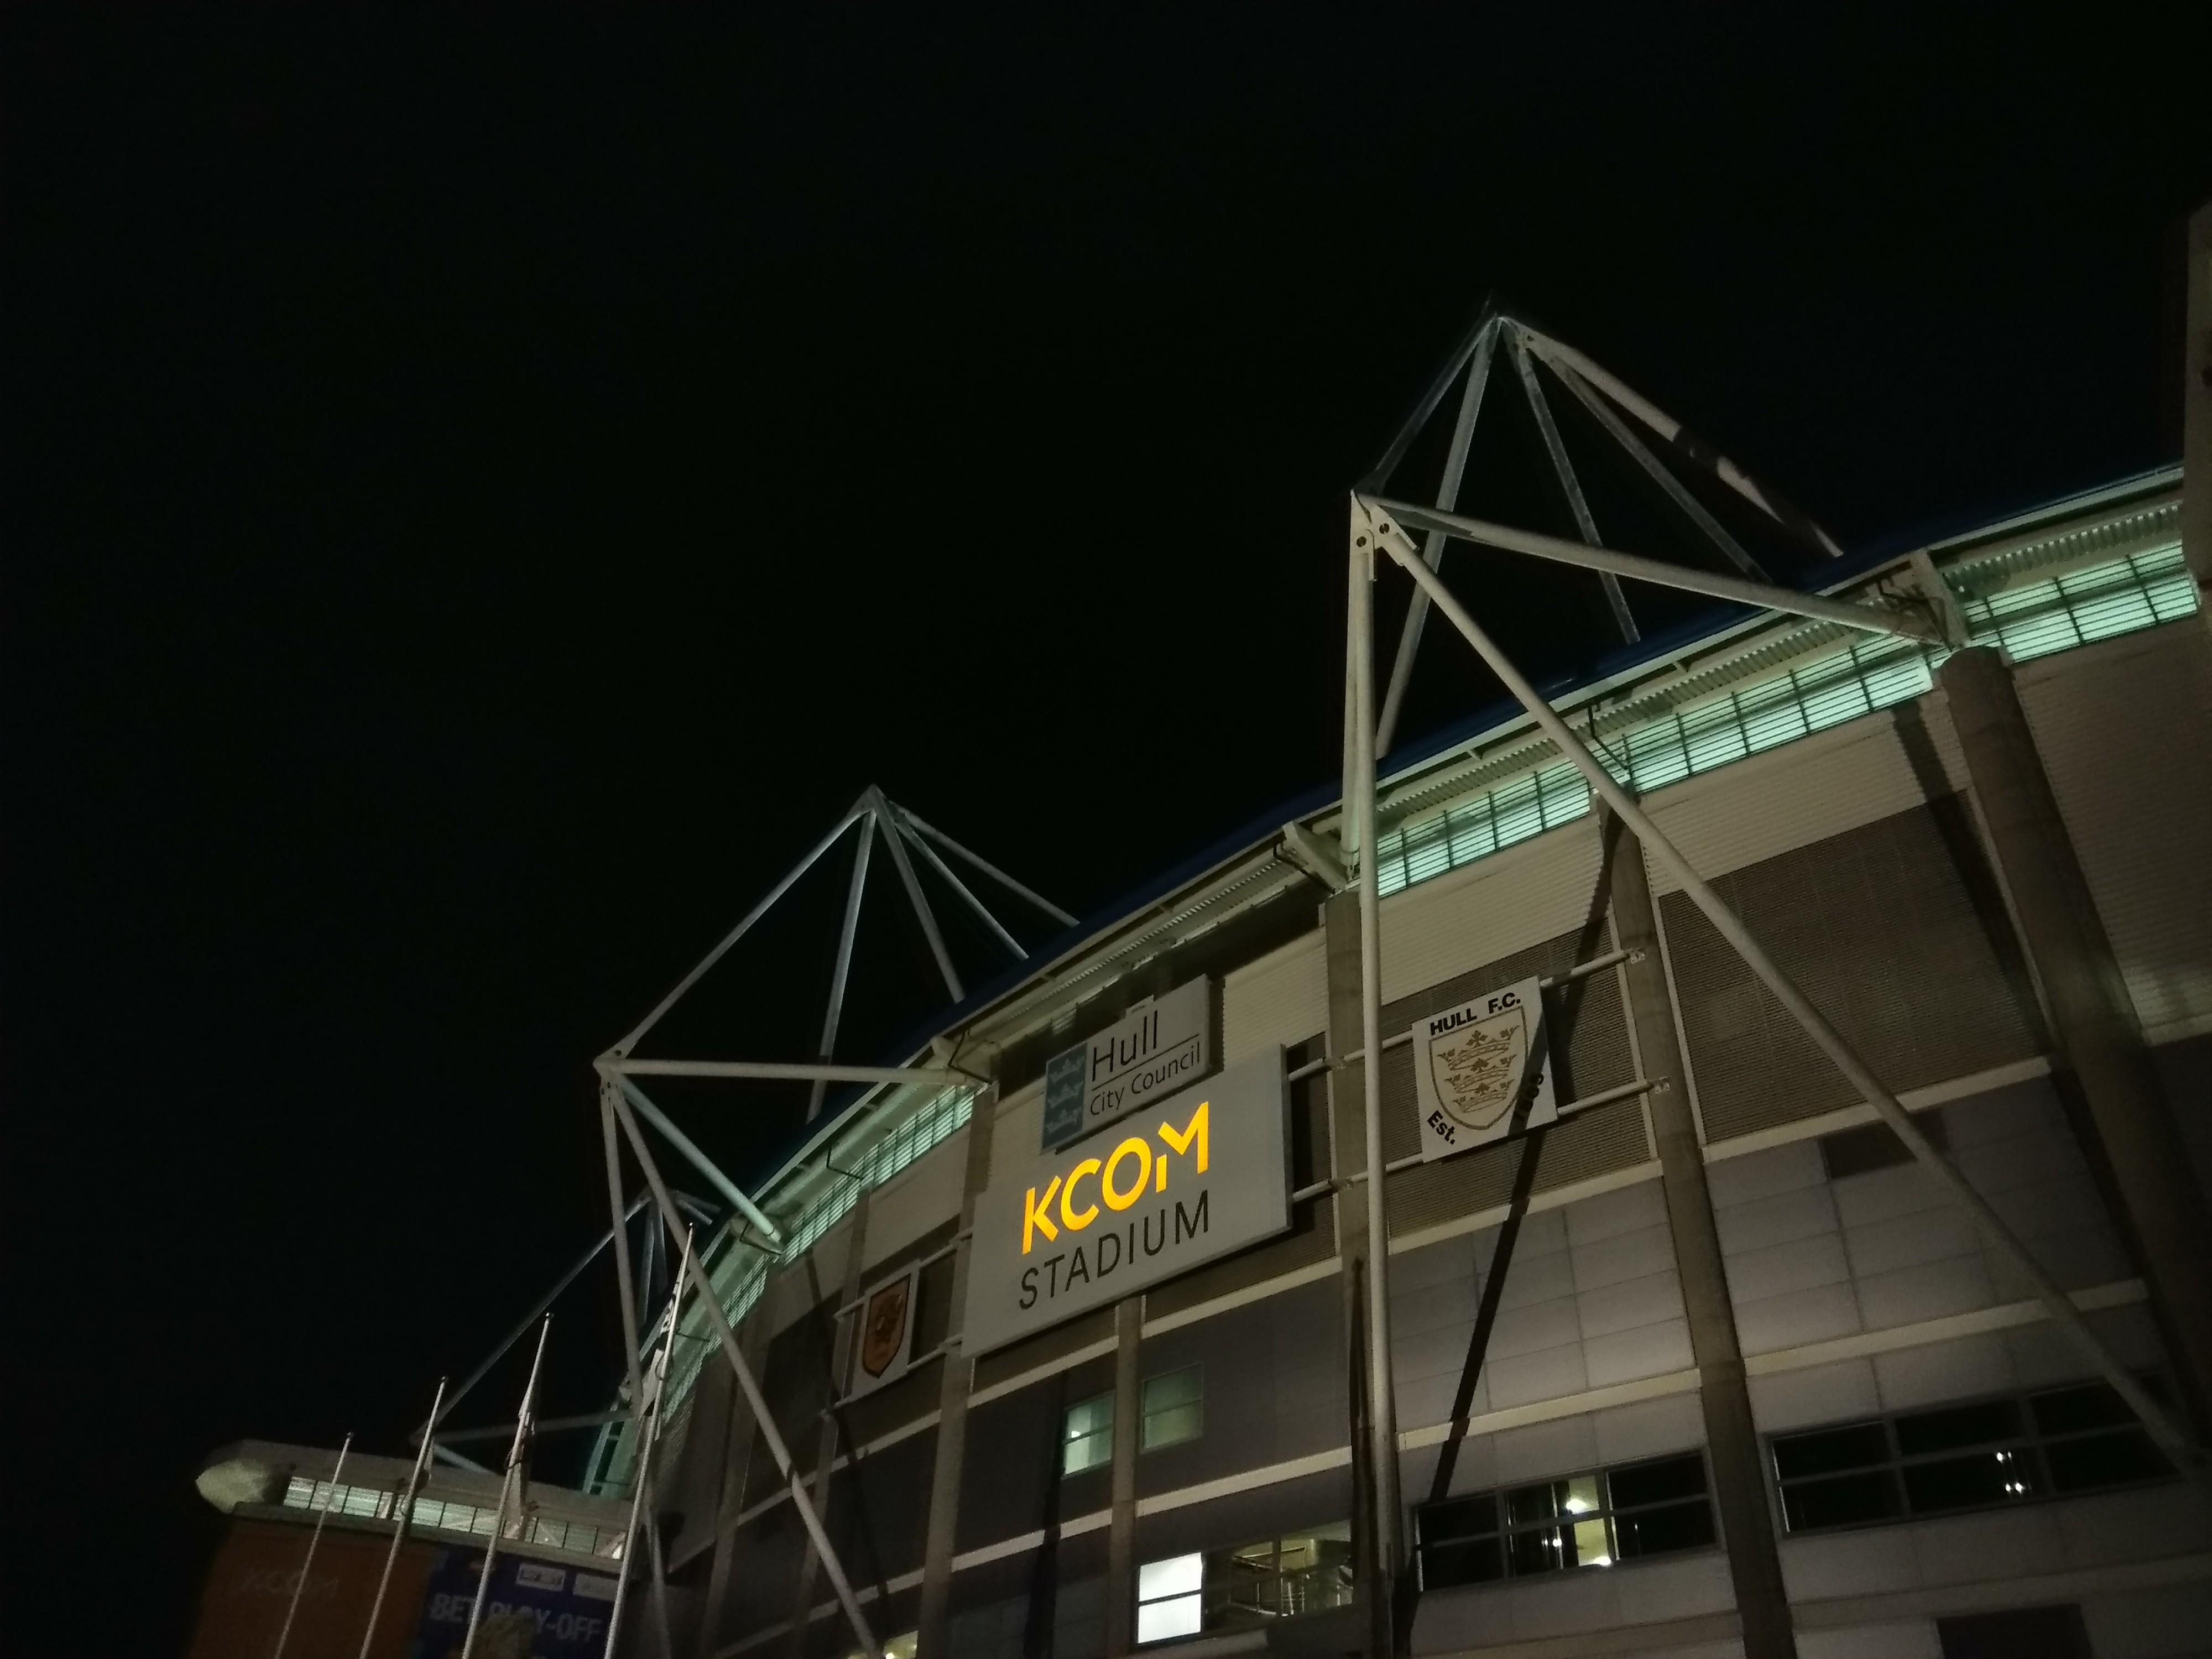 KCOM Stadium - Wikipedia